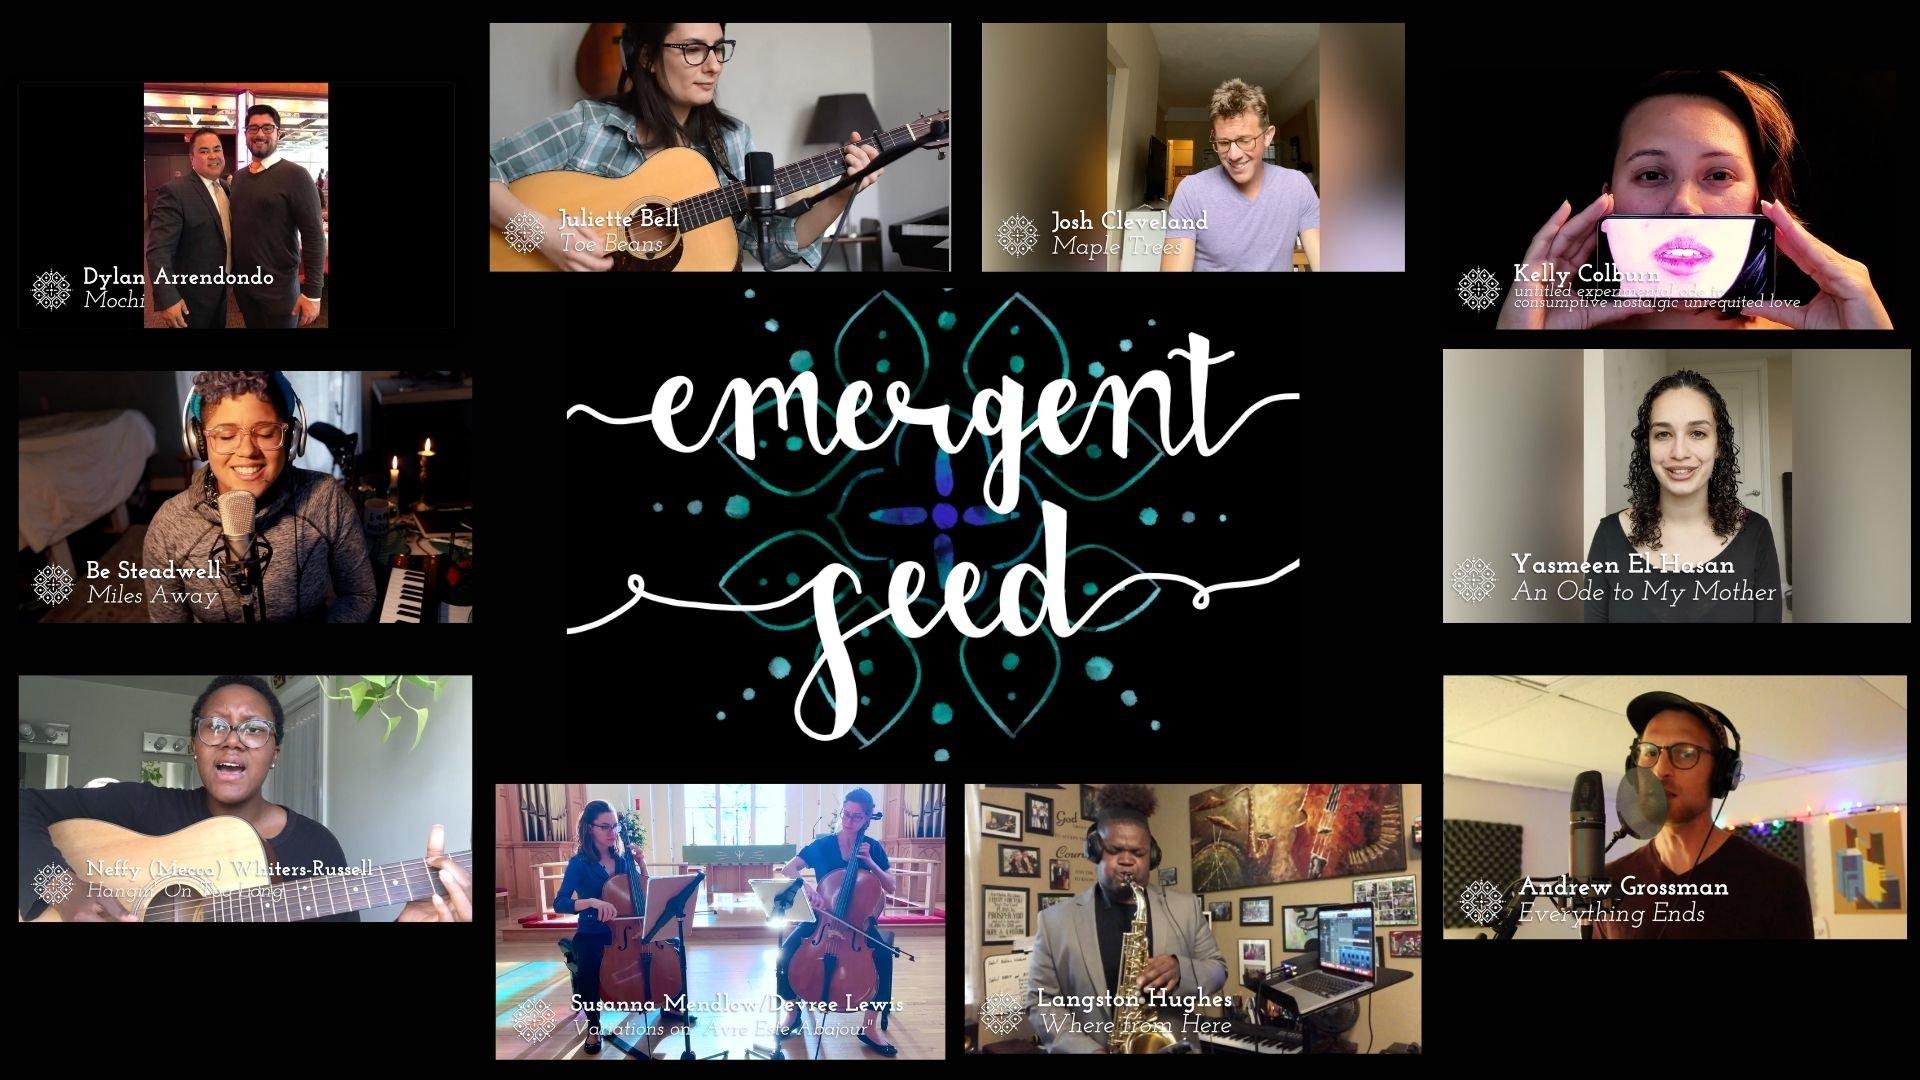 Emergent Seed